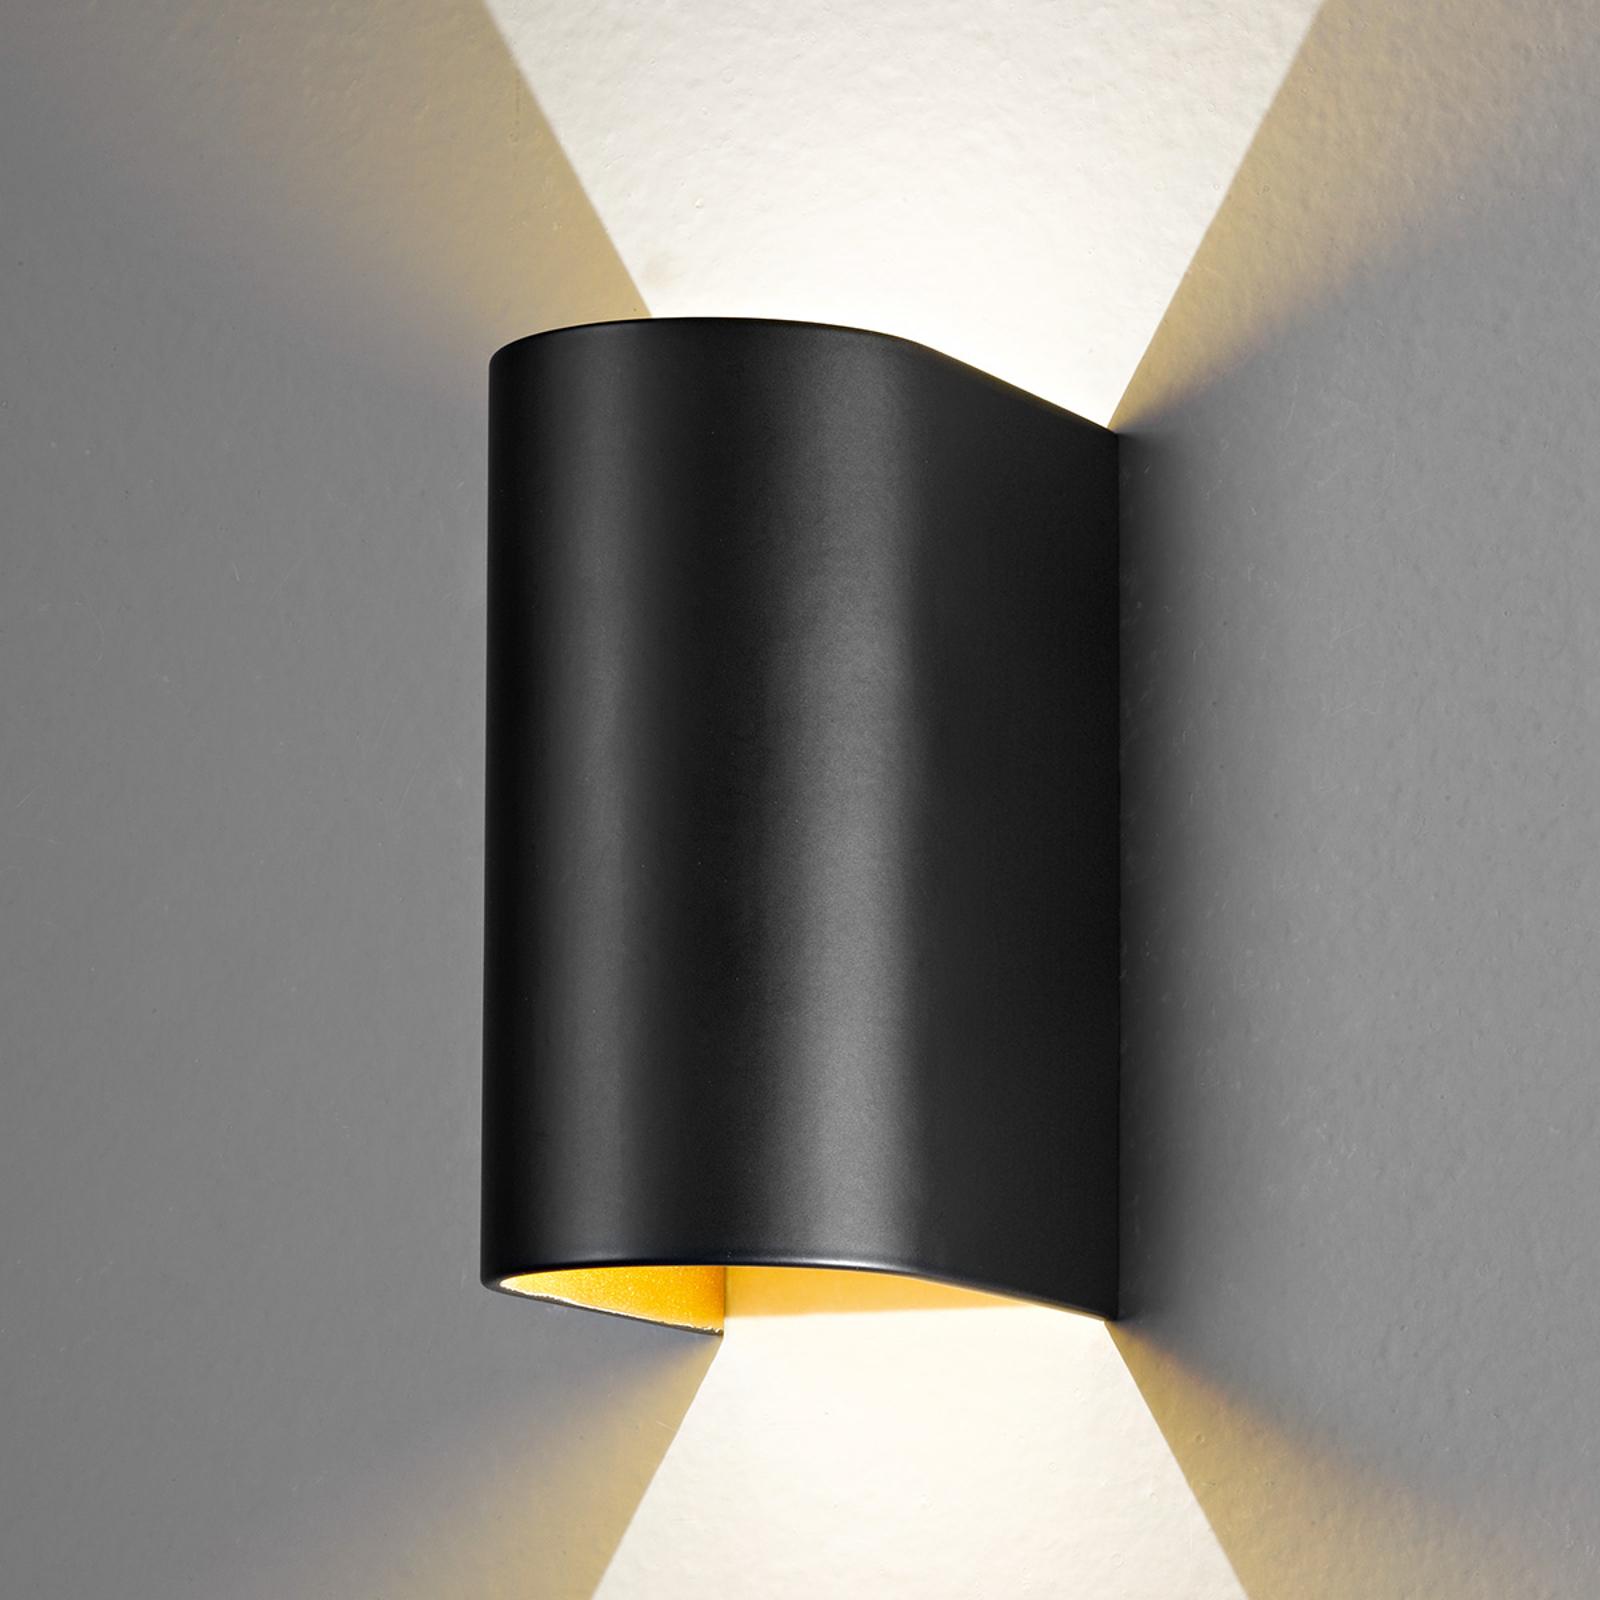 LED wandlamp Feeling, zwart-goud